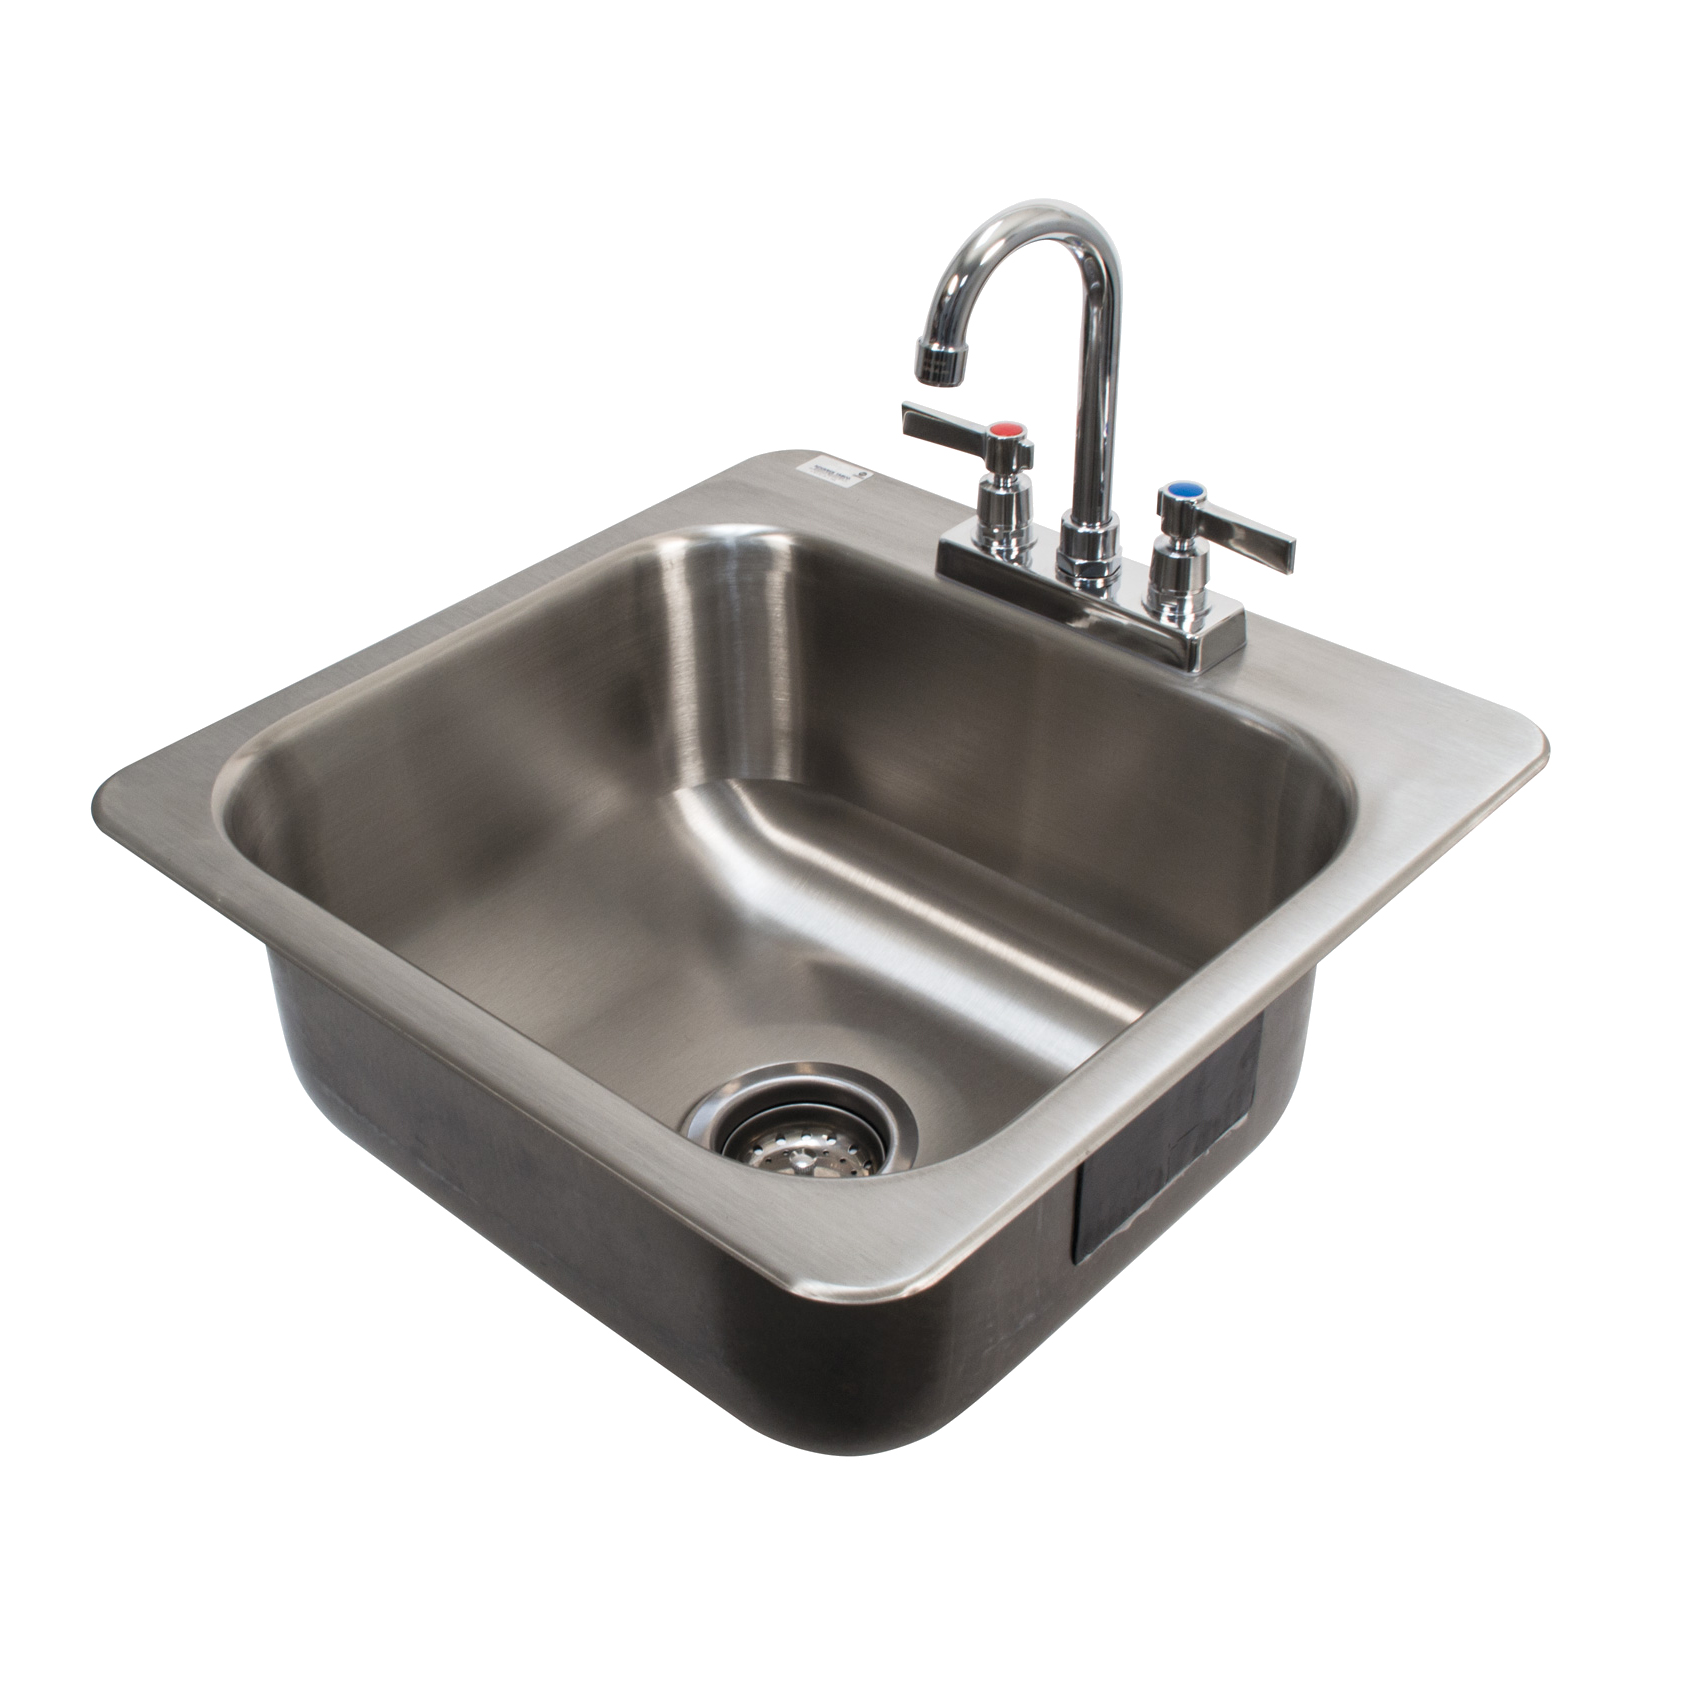 Advance Tabco DI-1-168-1X sink, drop-in